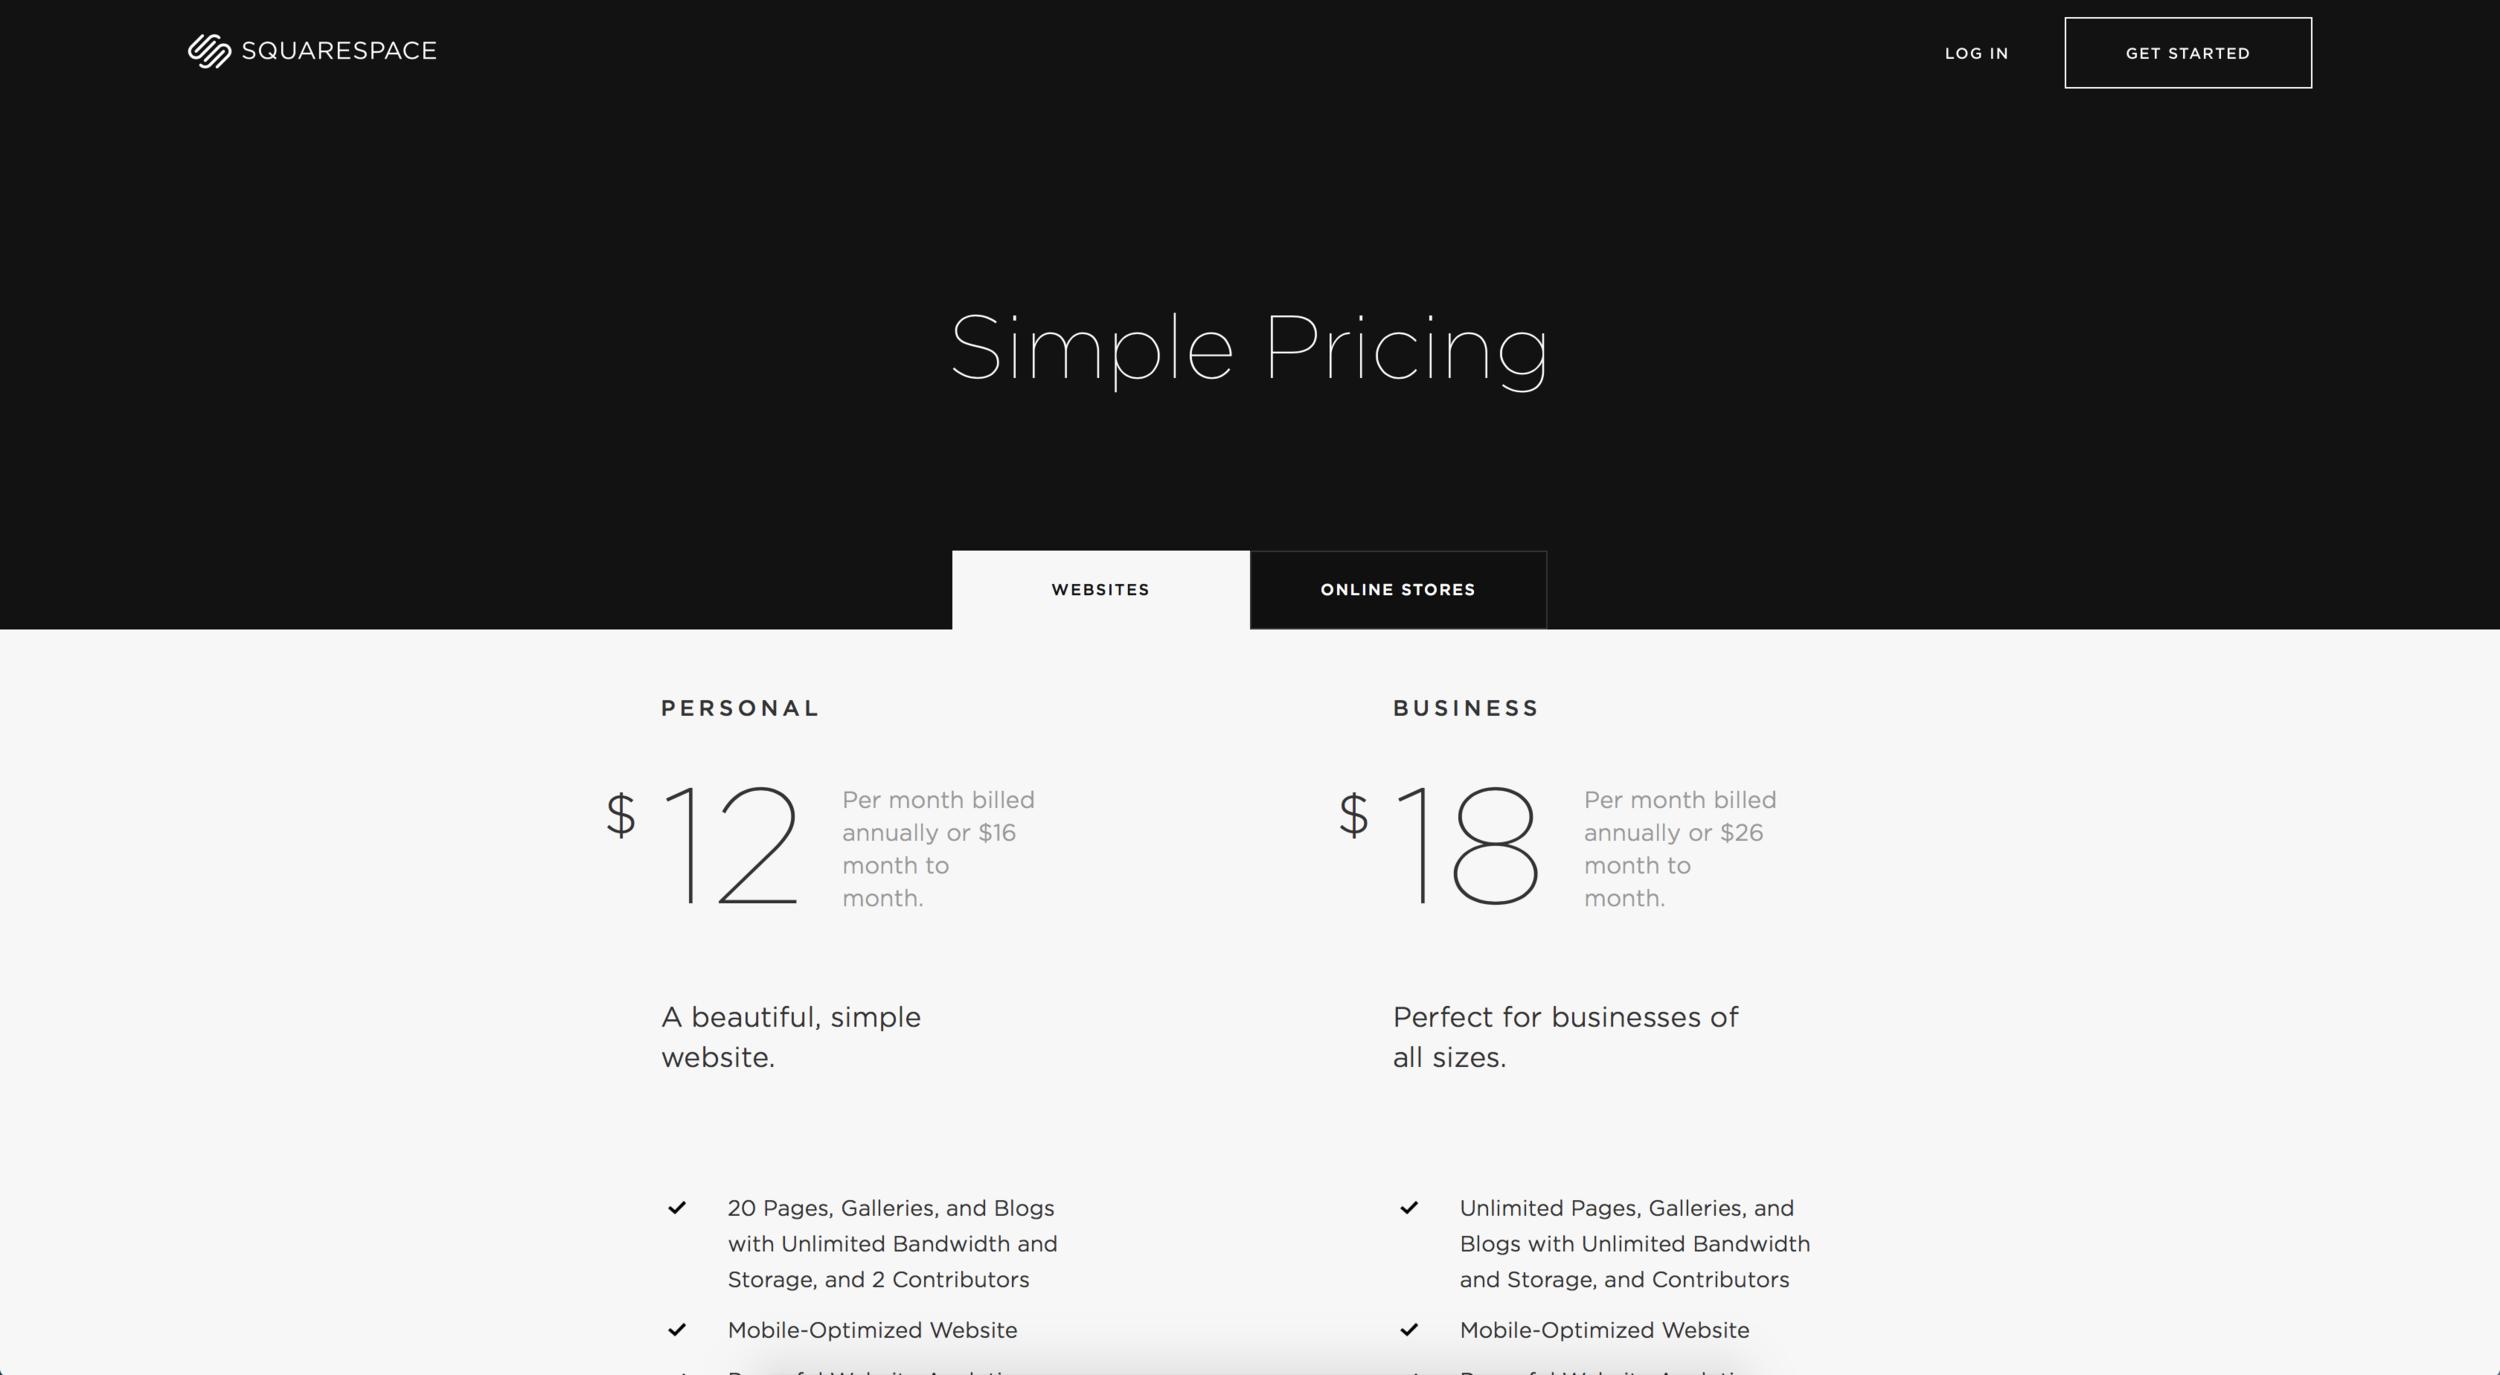 Hello-Mammoth-Blog-Squarespace-Web-Design-Marketing-Small-Business